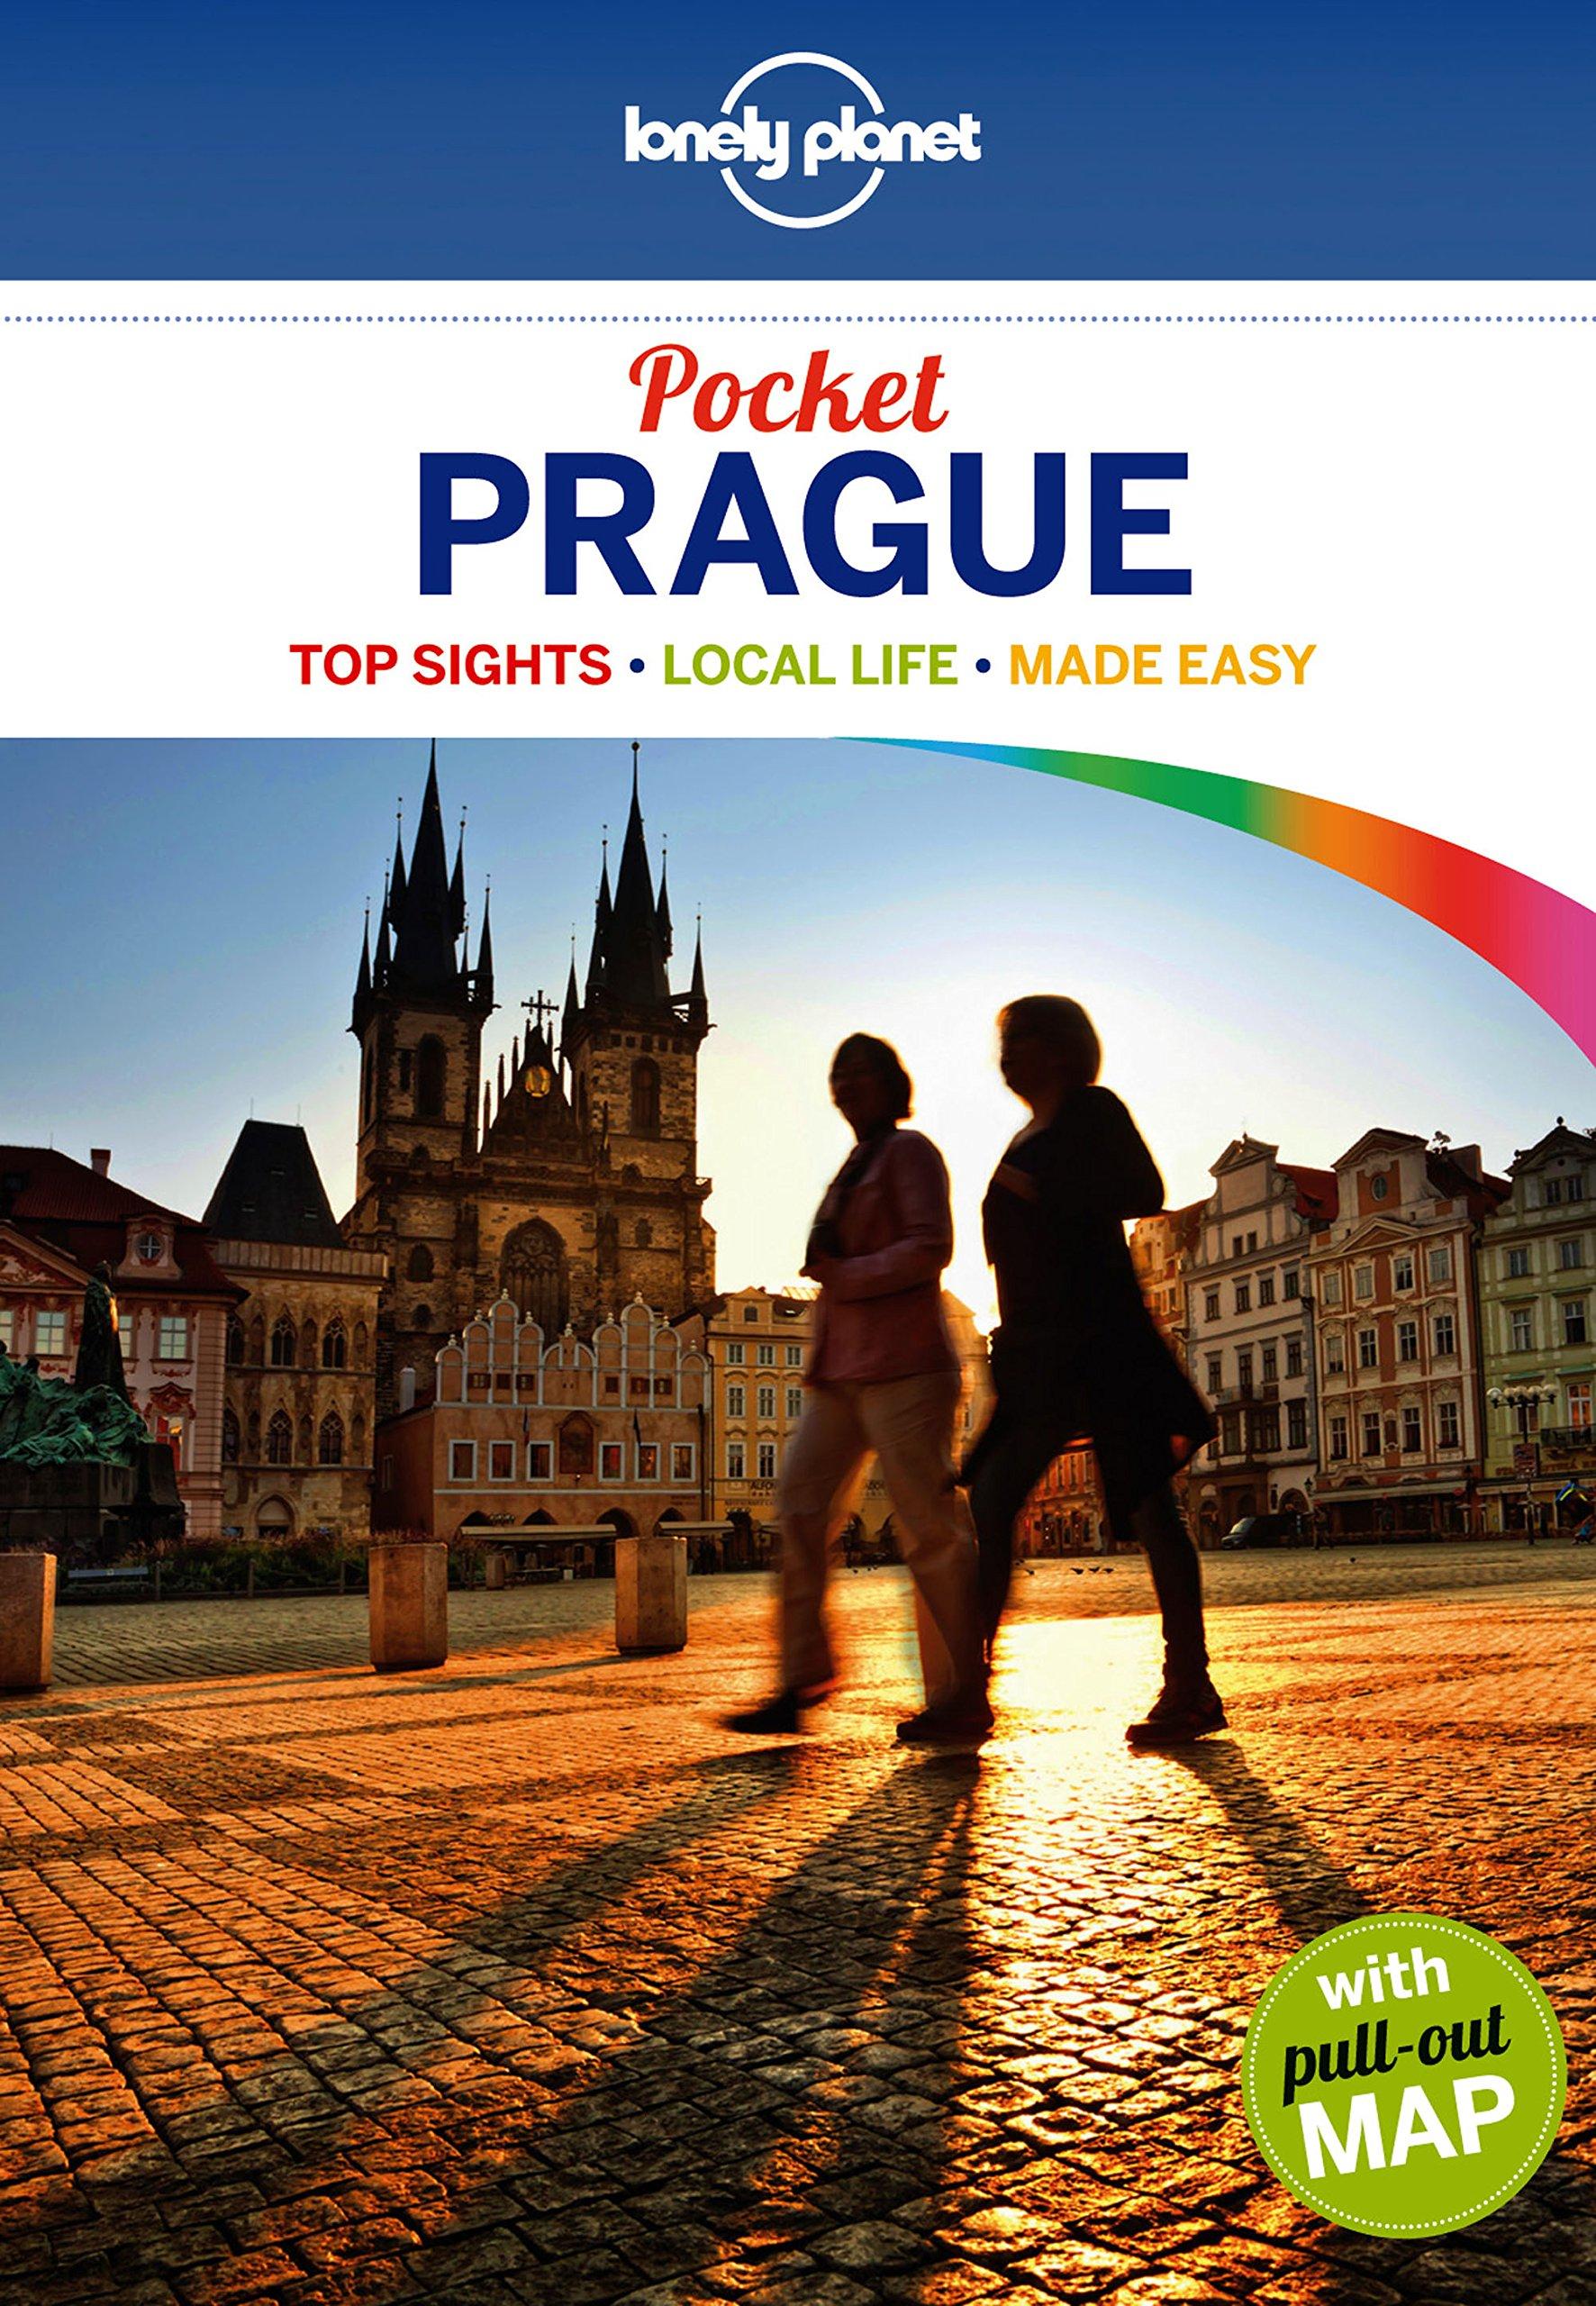 Lonely Planet Pocket Prague (Travel Guide) ISBN-13 9781742208787